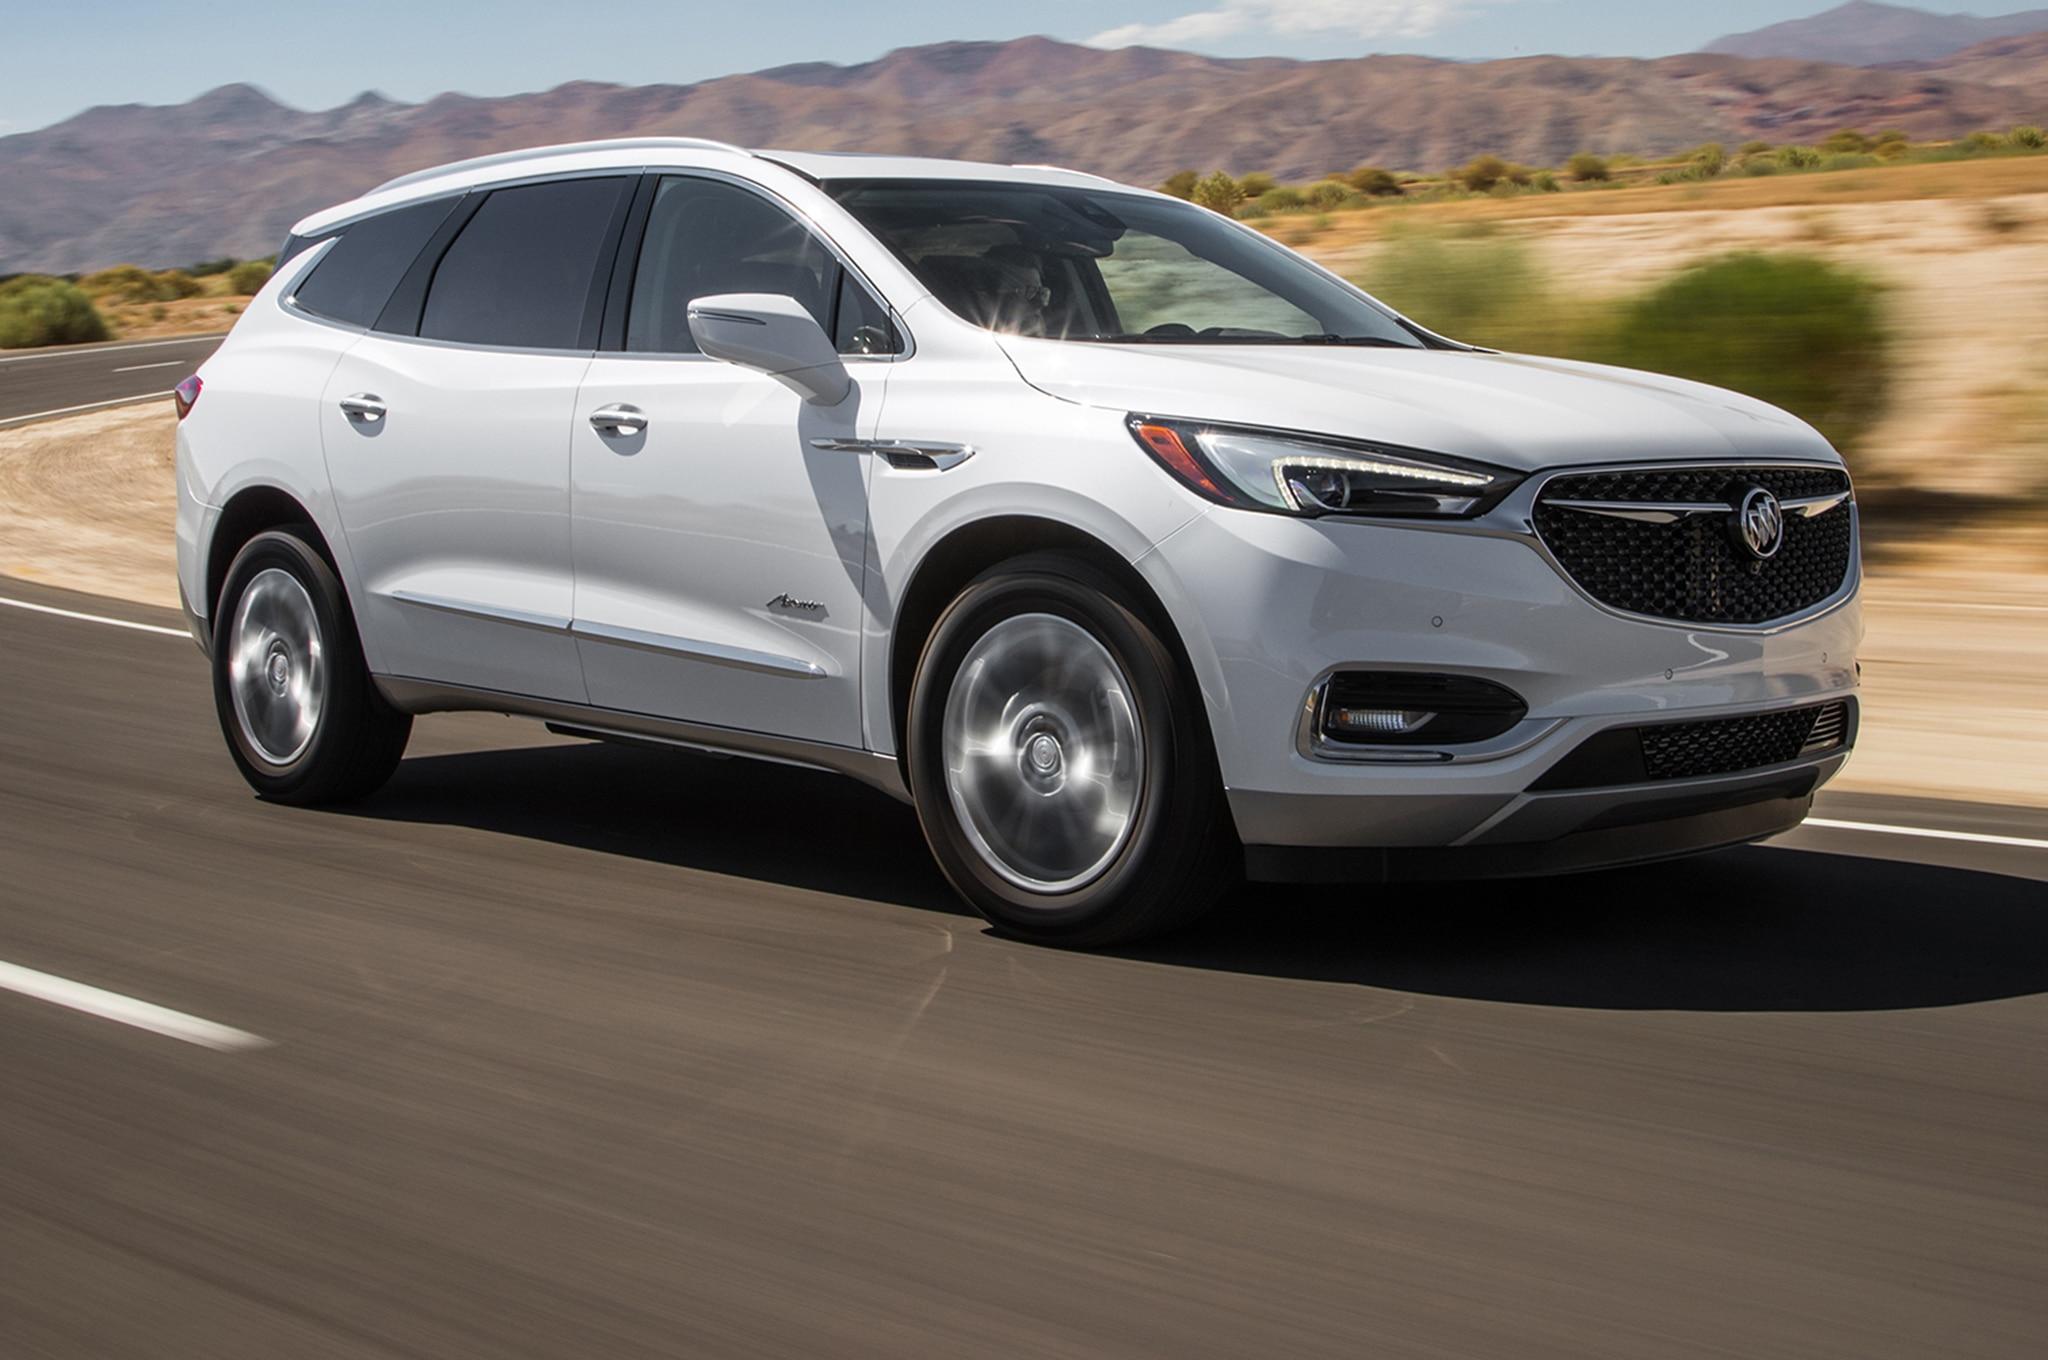 2018 Buick Enclave Avenir Front Three Quarter In Motion 00